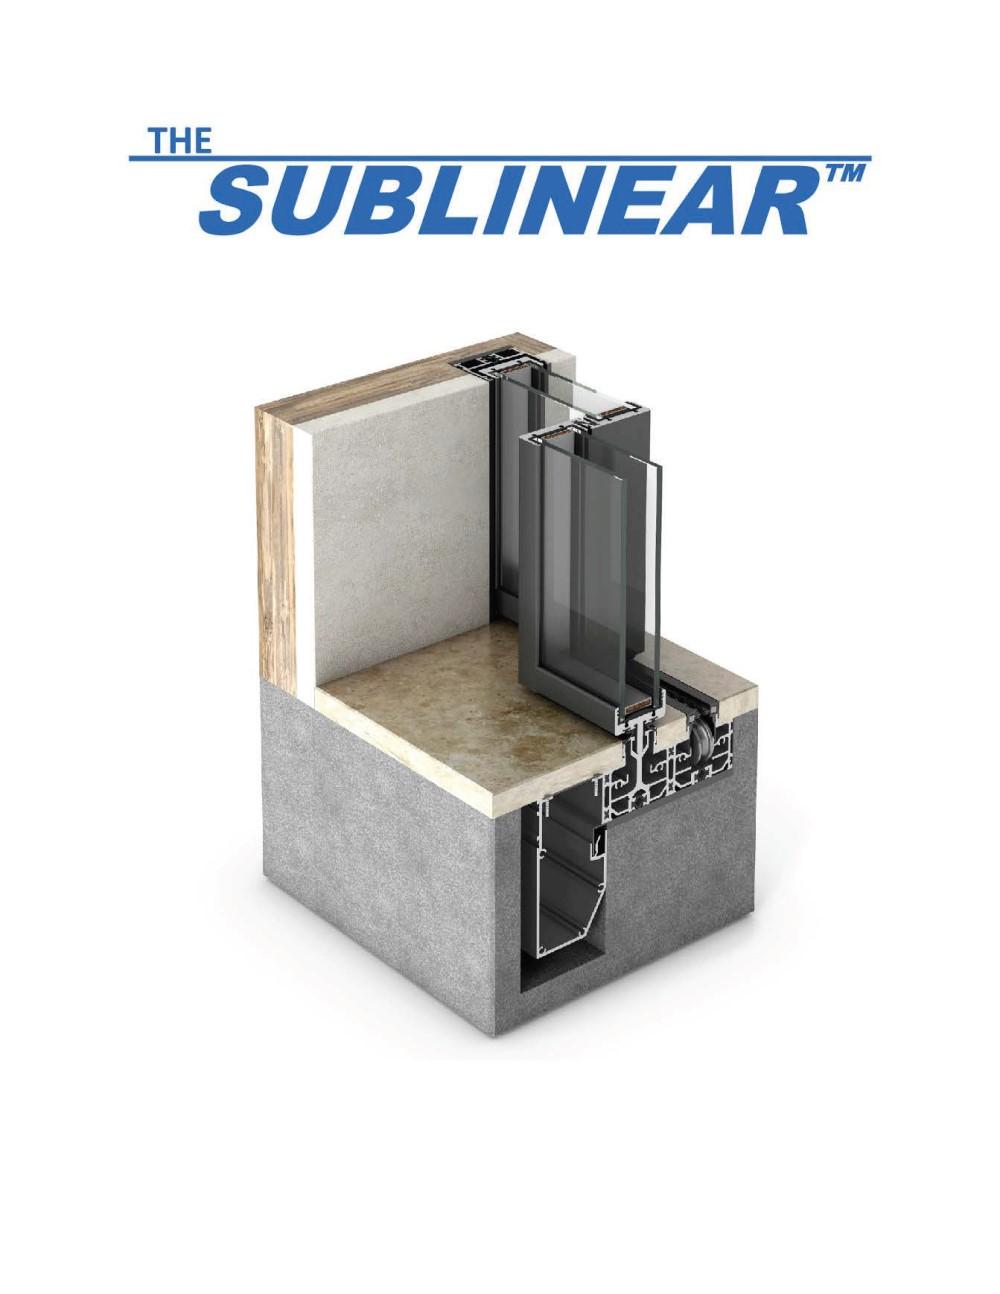 Sublinear